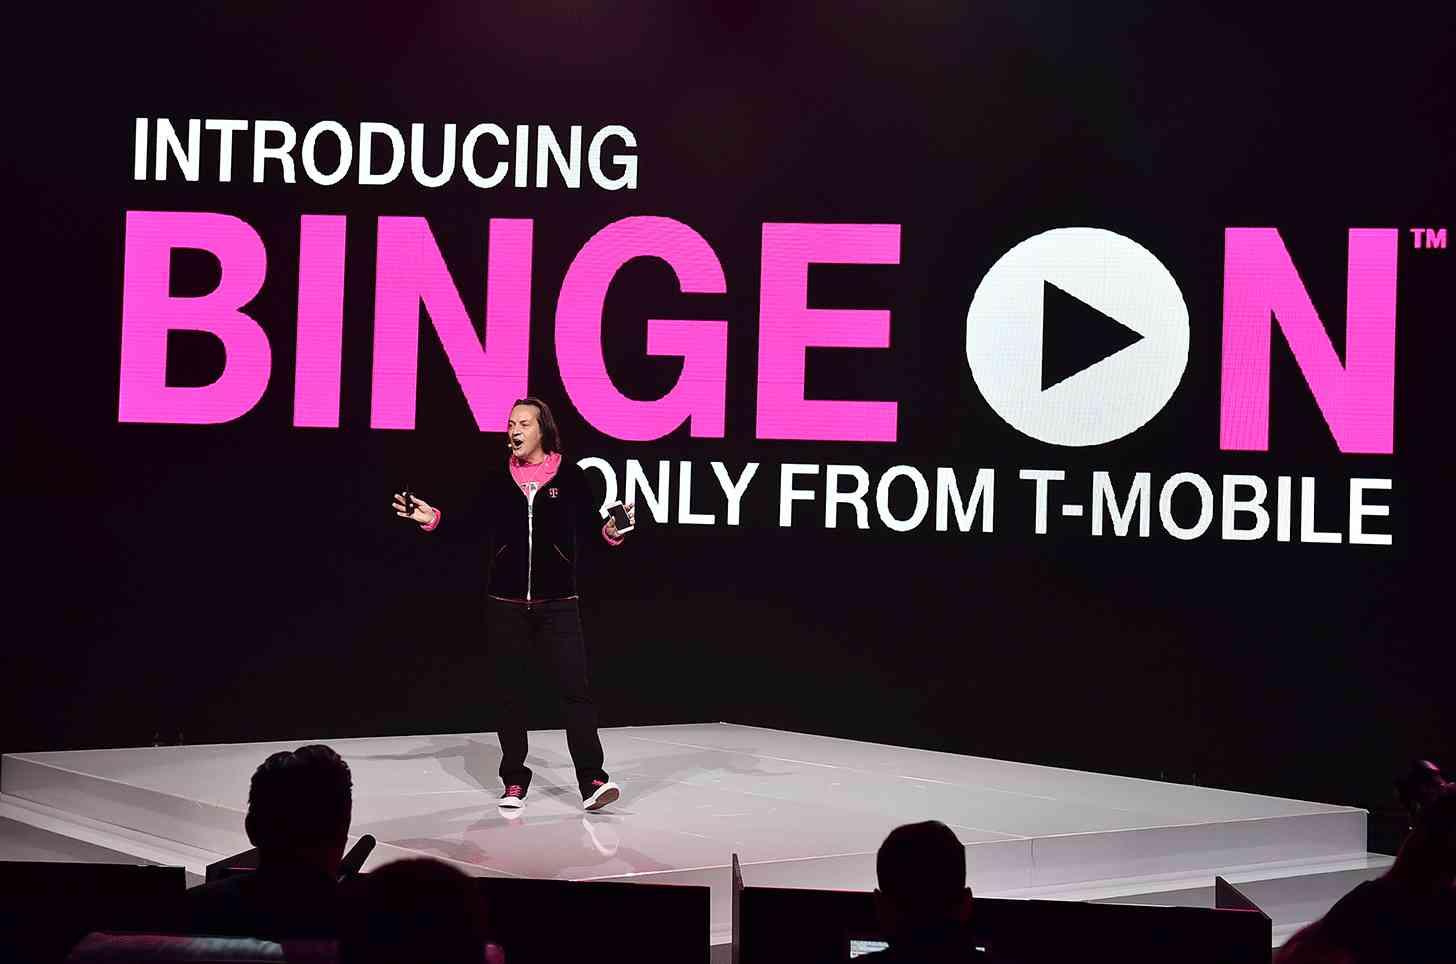 T-Mobile CEO John Legere Binge On announcement